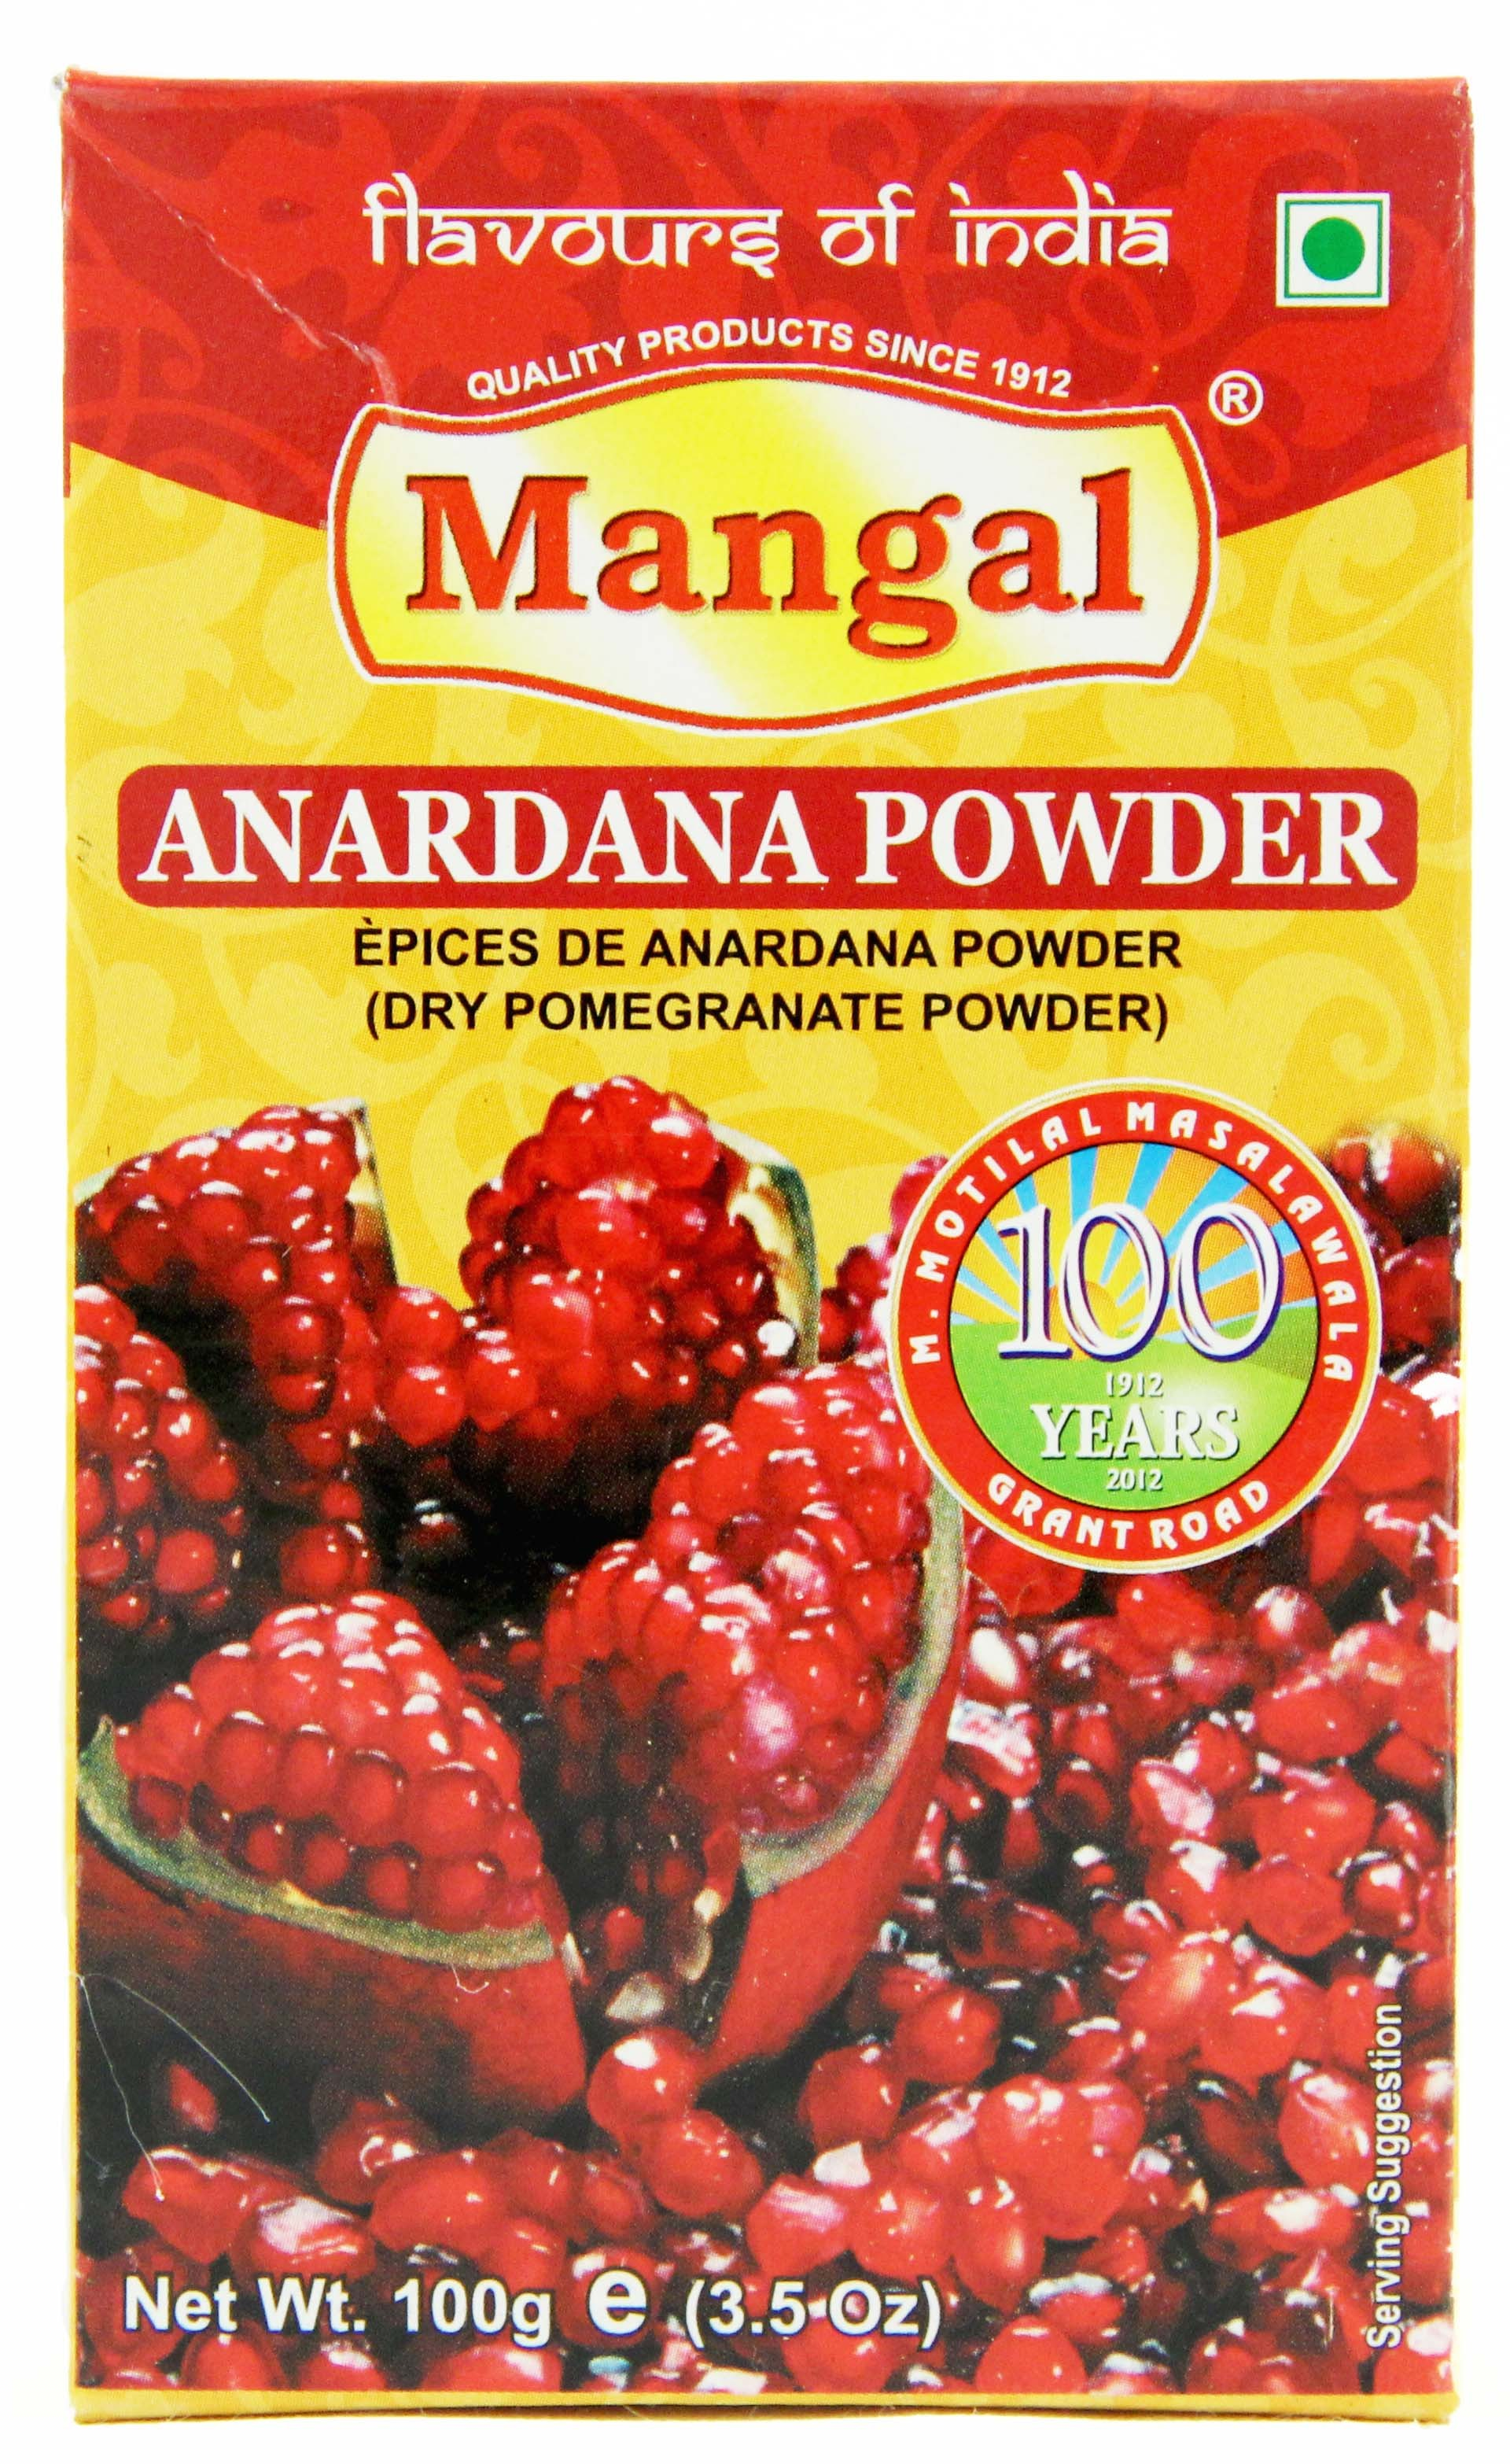 Mangal Anardana Powder 100g